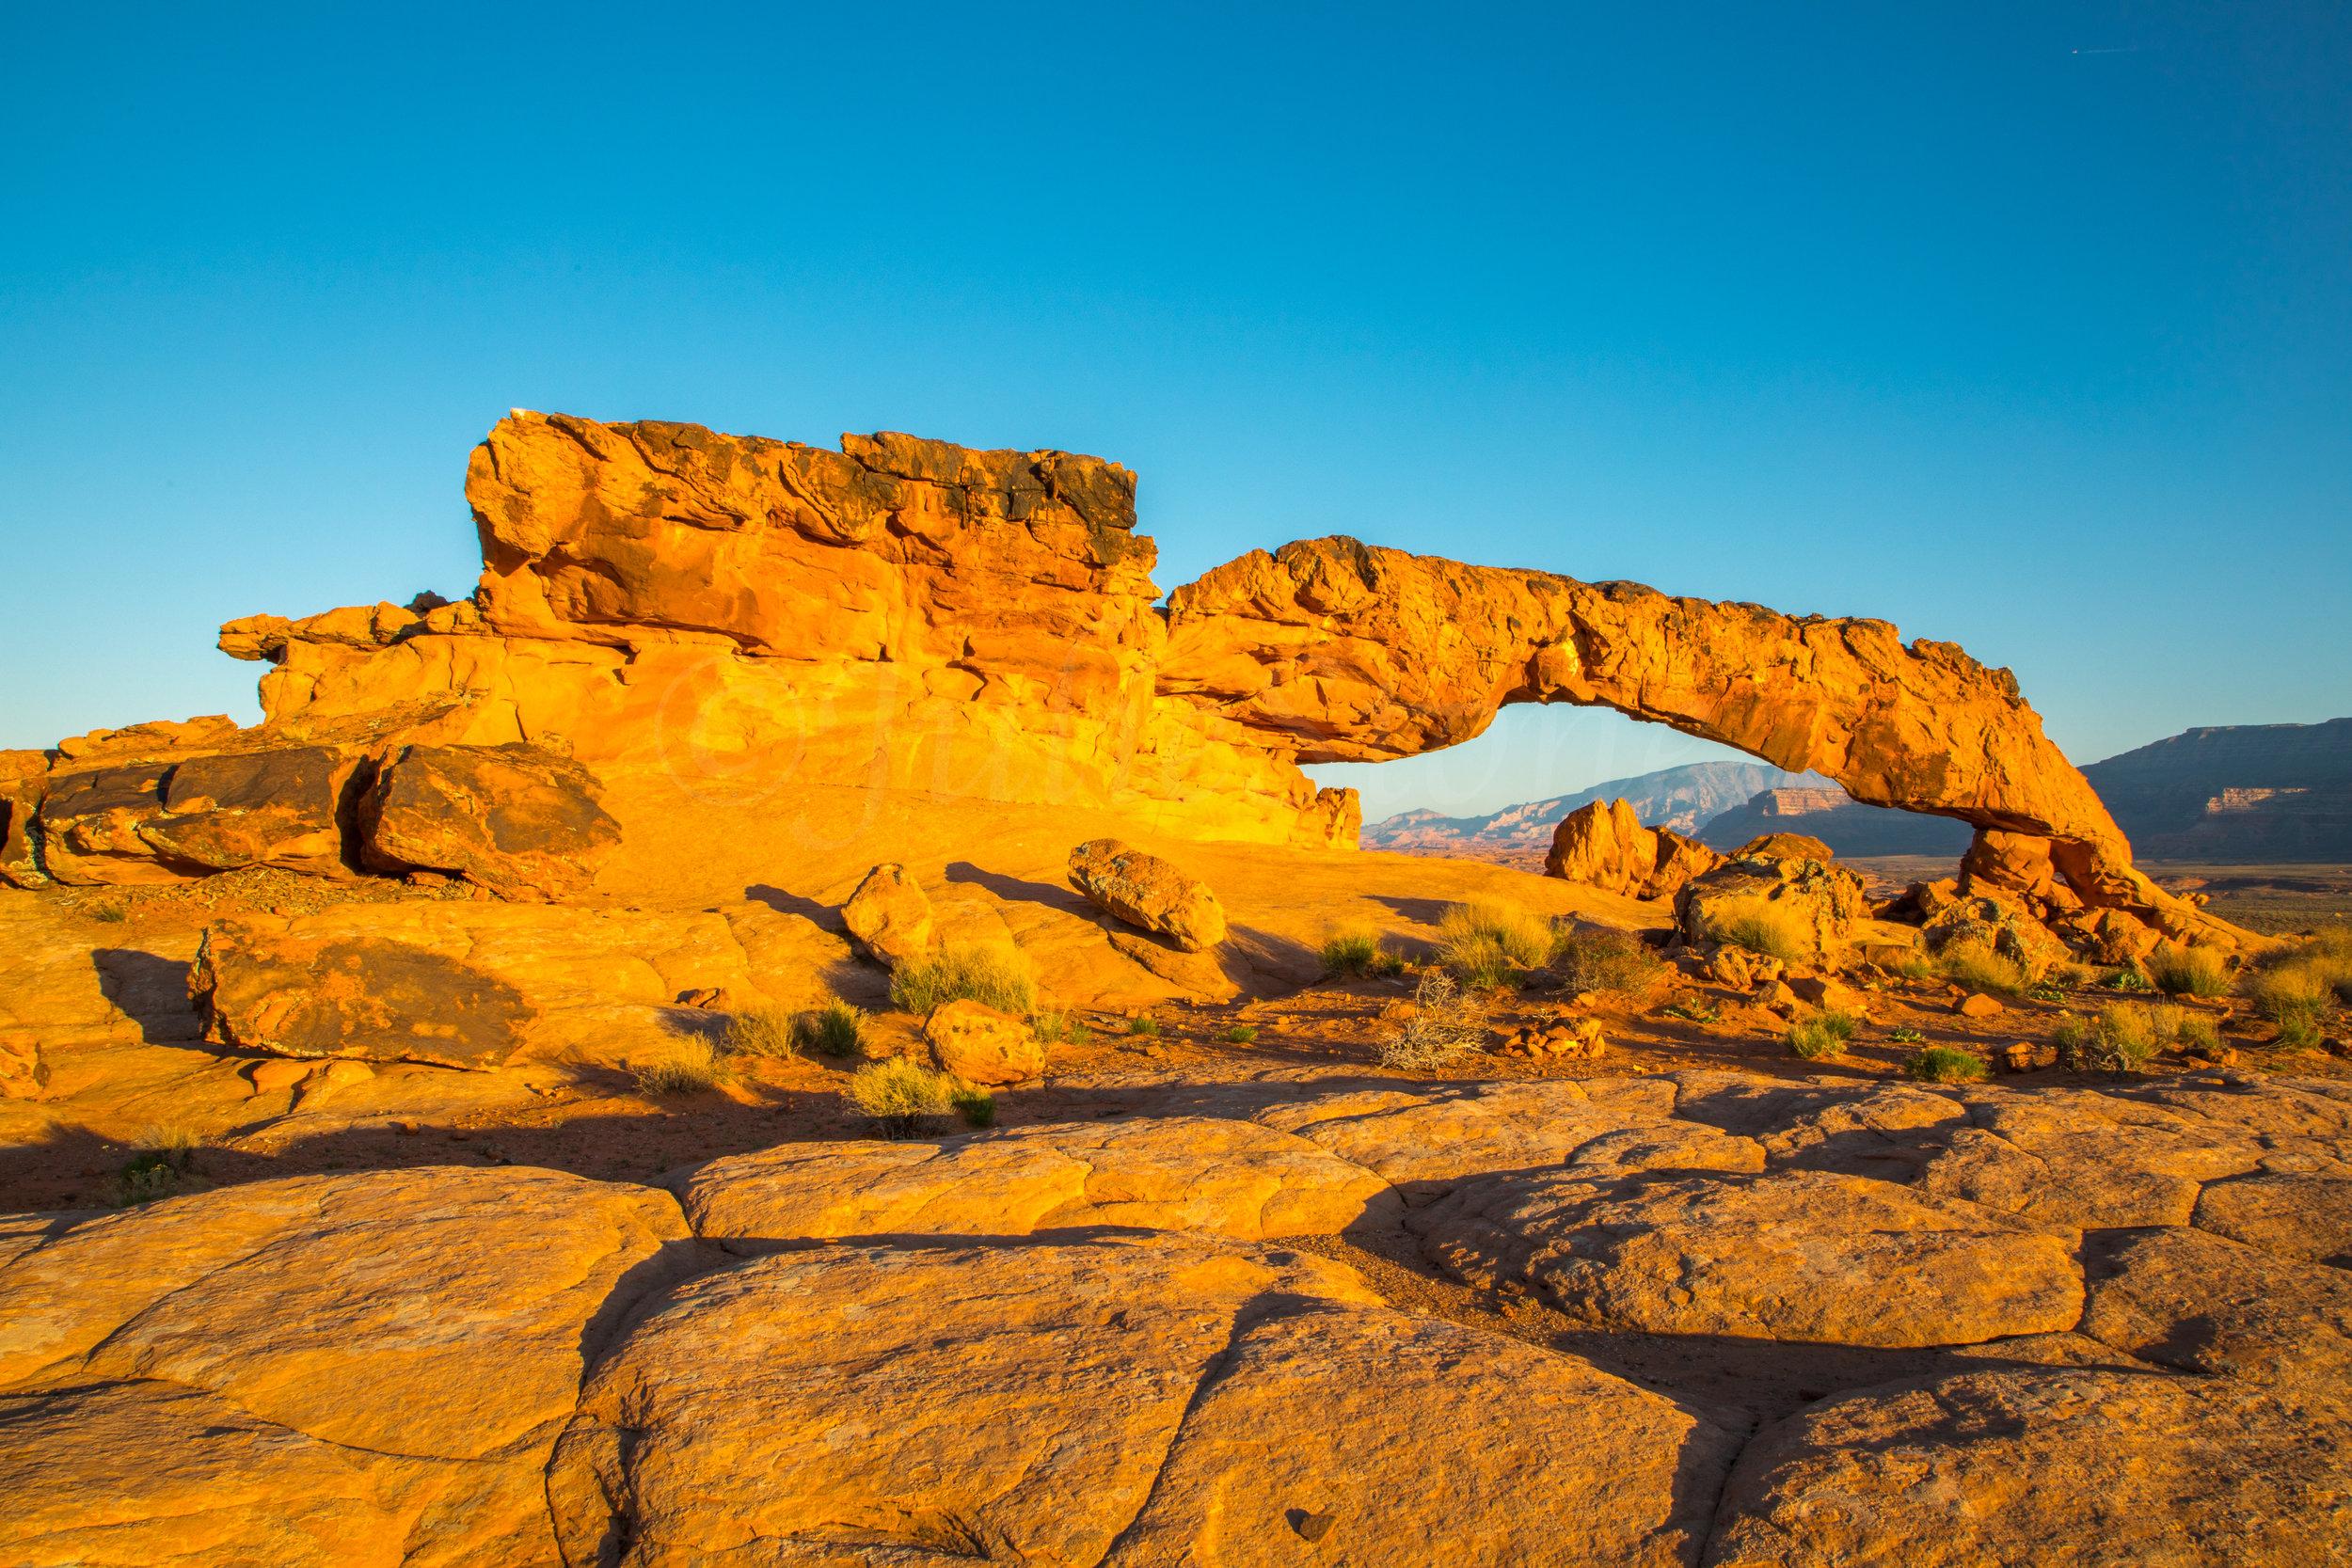 Sunset Arch, Image # 3048